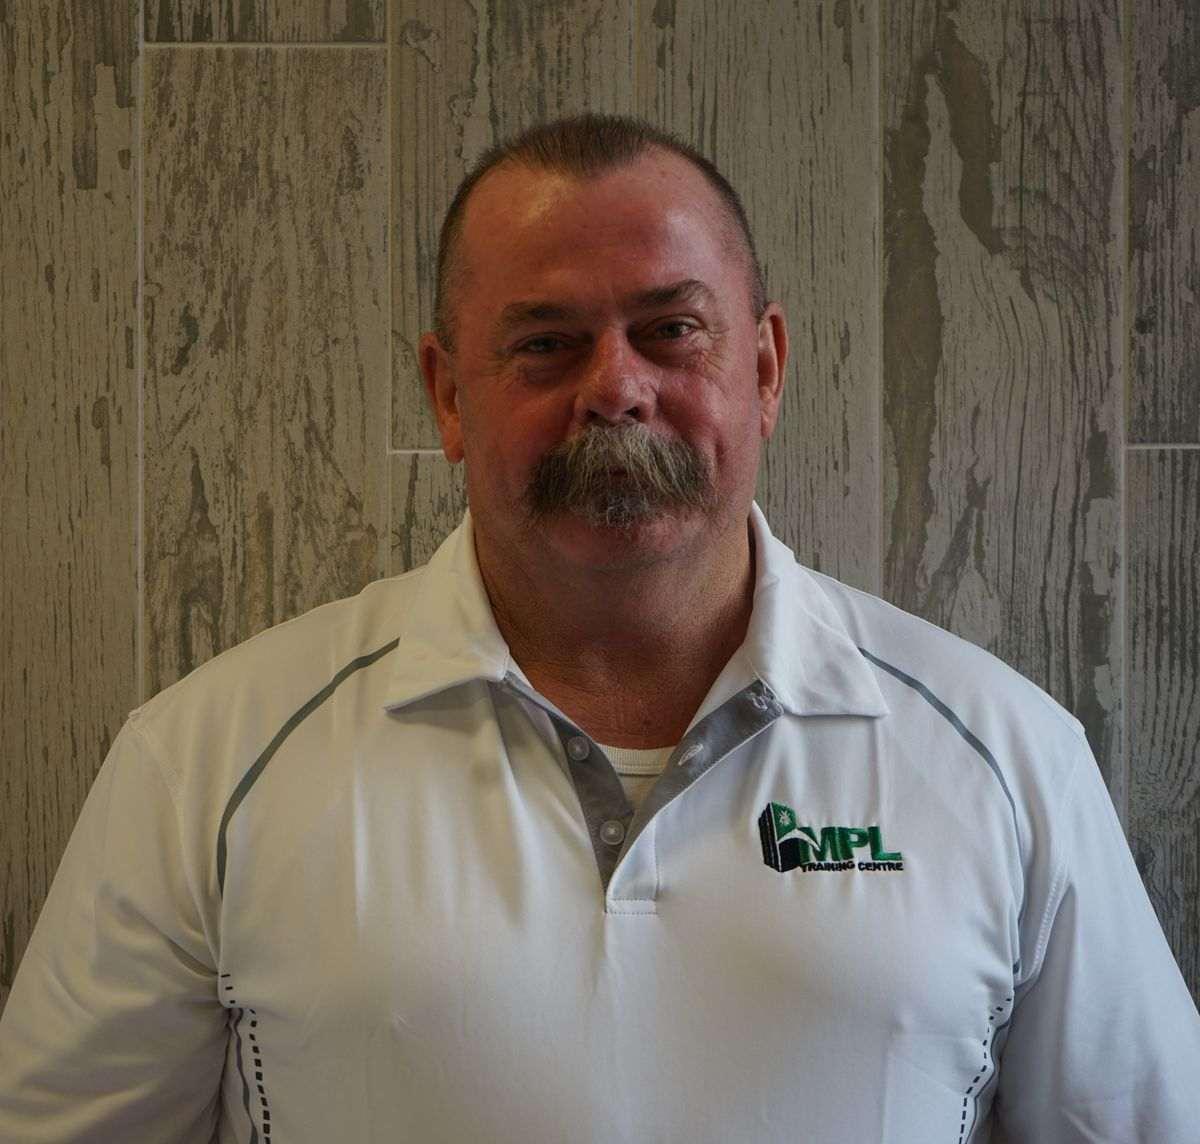 Gary Cochrane - MPL Trainer and assessor